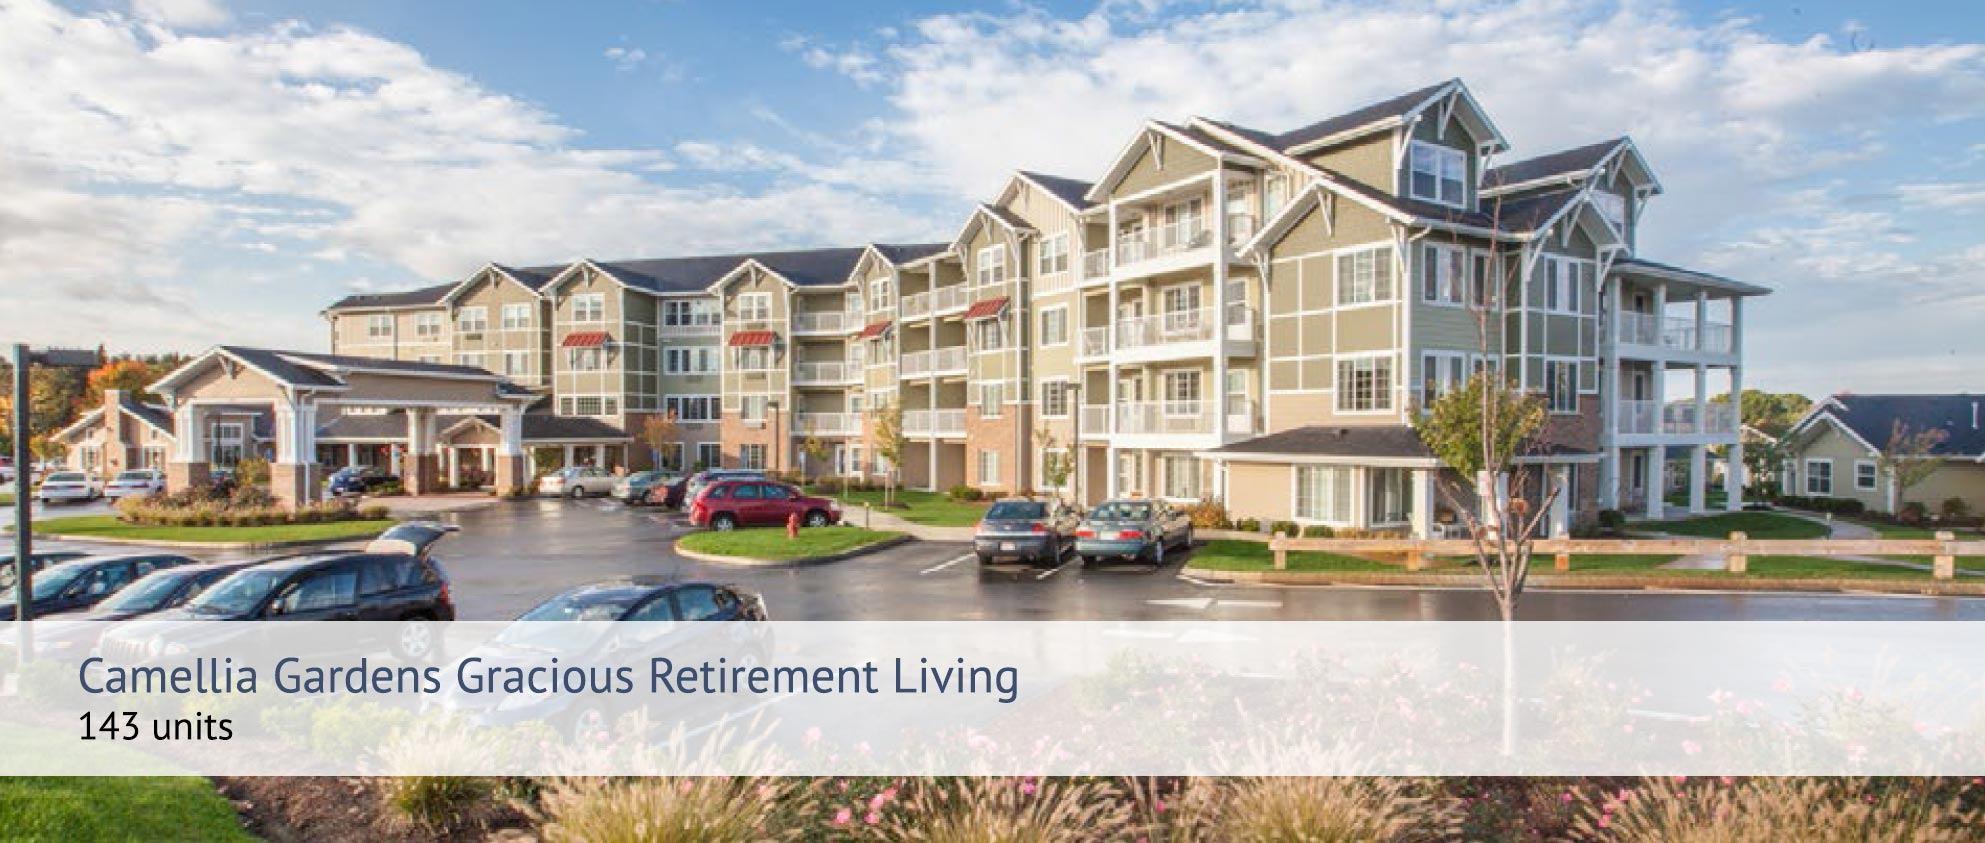 camellia-gardens-gracious-retirement-living-inset